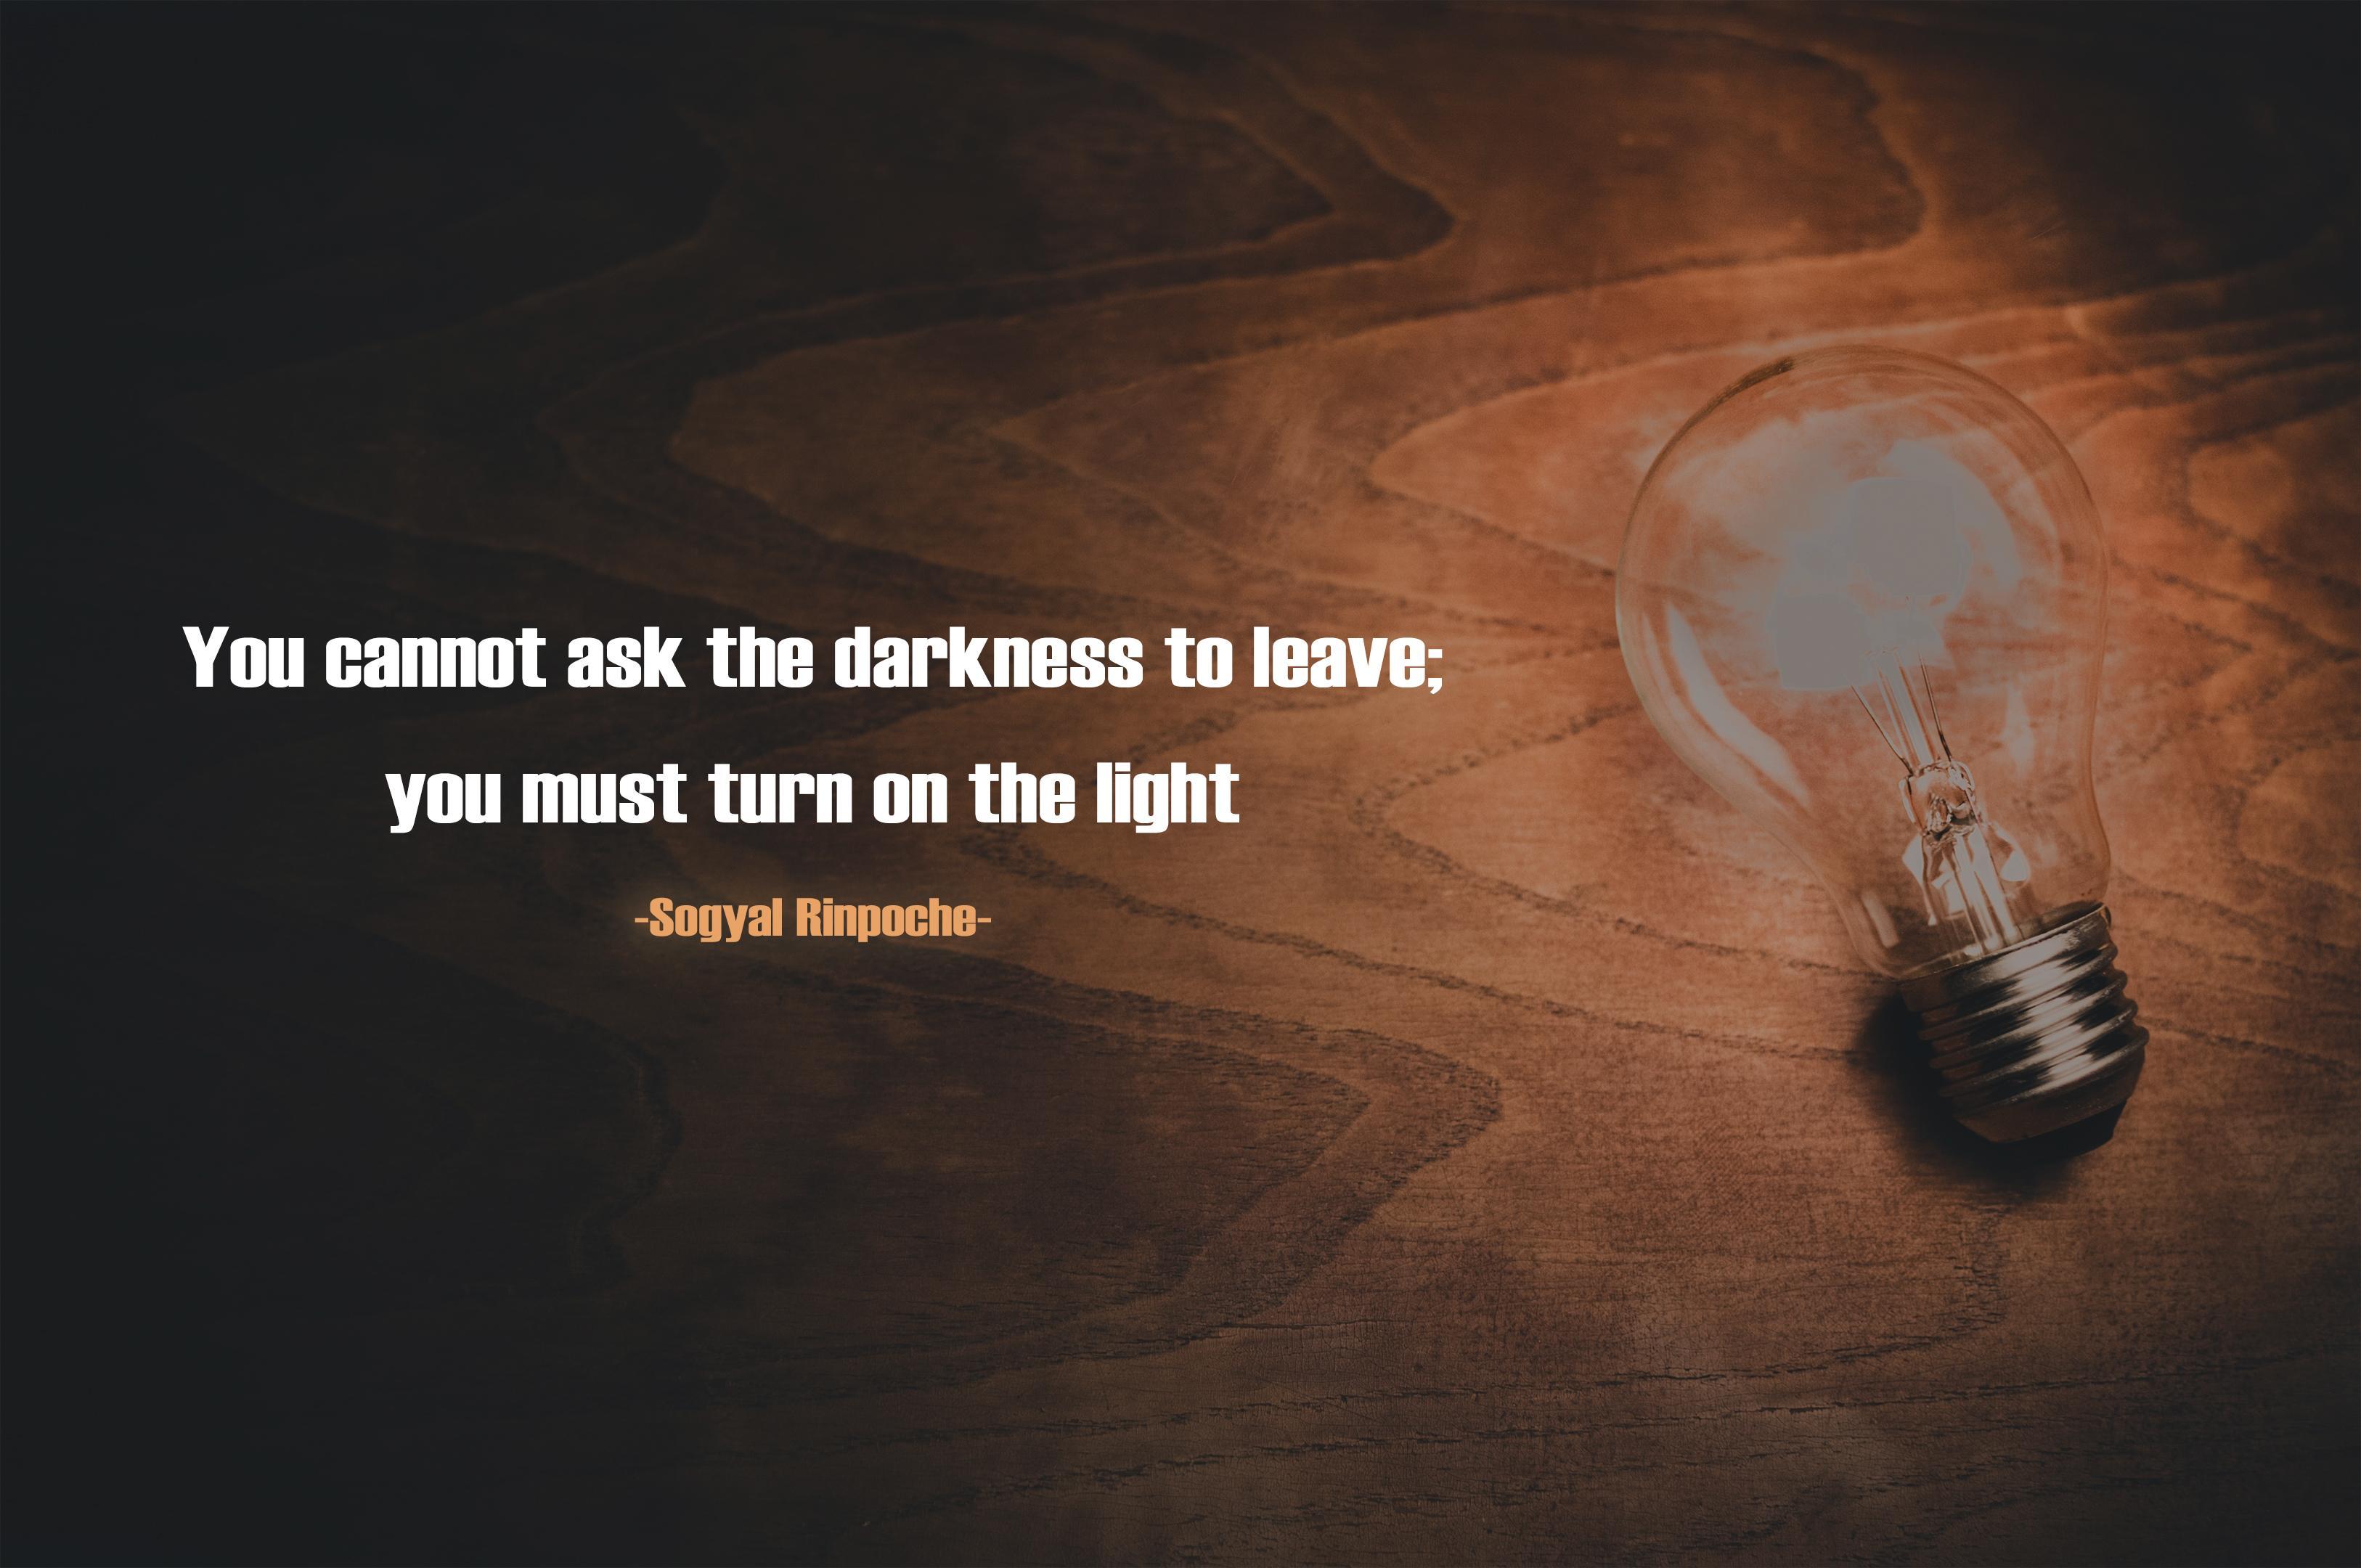 Yllll cannot 38k the darknes Vflll IIIIISt tlll'll [III the Ii -Snnyal Ilinnuehn— .. gu' ;_. https://inspirational.ly